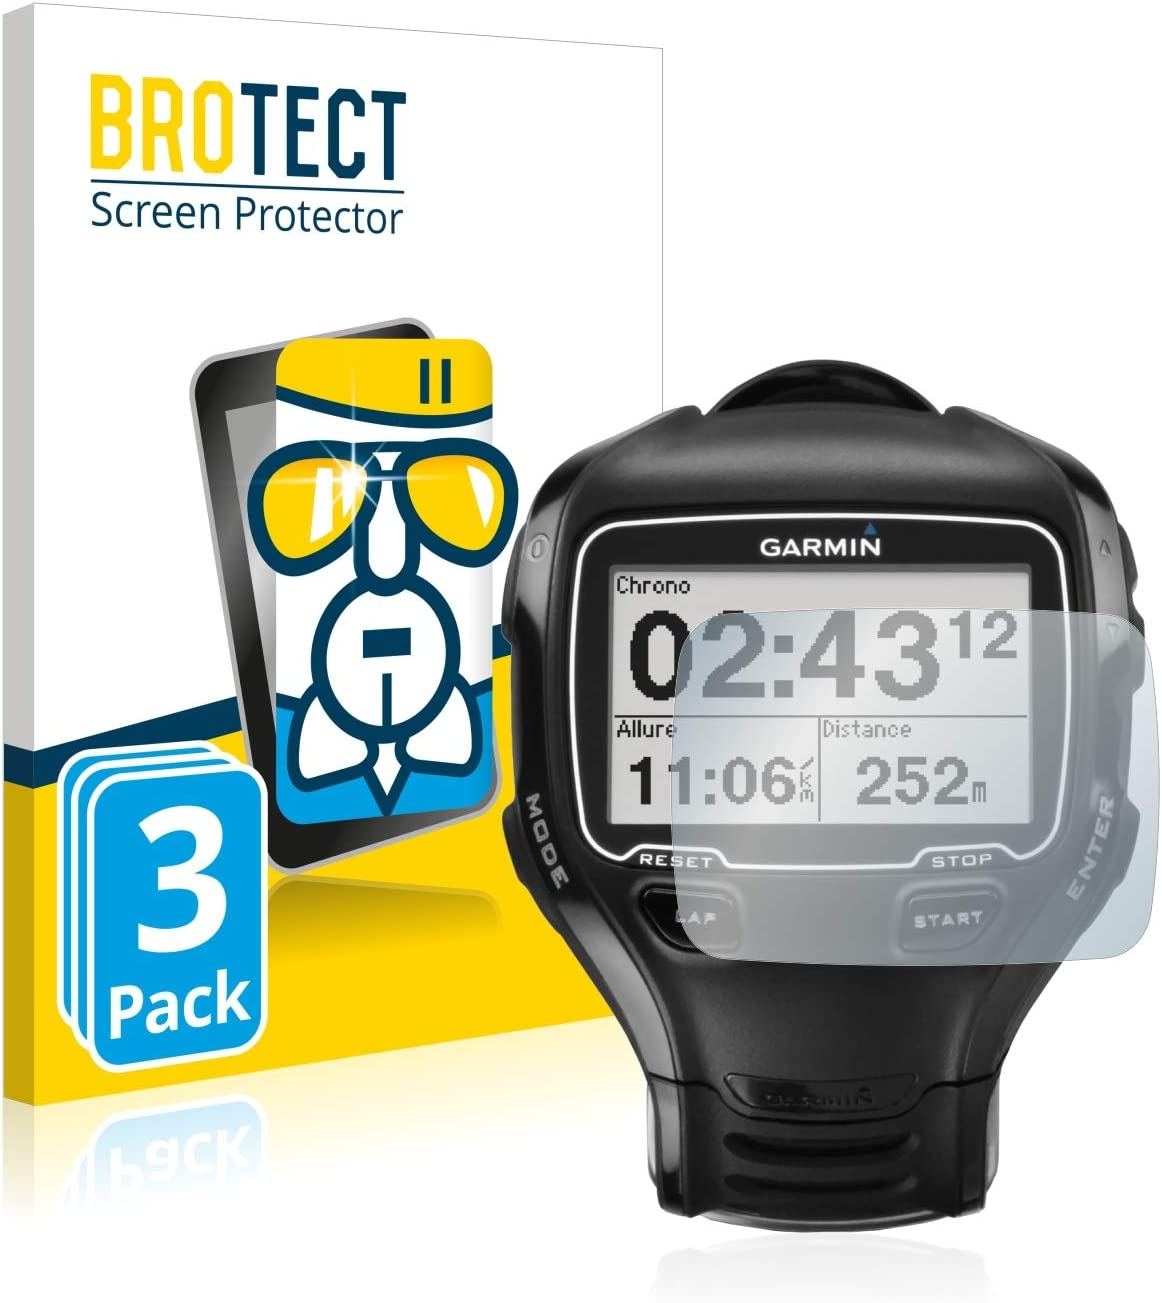 BROTECT Protector Pantalla Cristal Compatible con Garmin Forerunner 910XT Protector Pantalla Vidrio (3 Unidades) - Dureza Extrema, Anti-Huellas